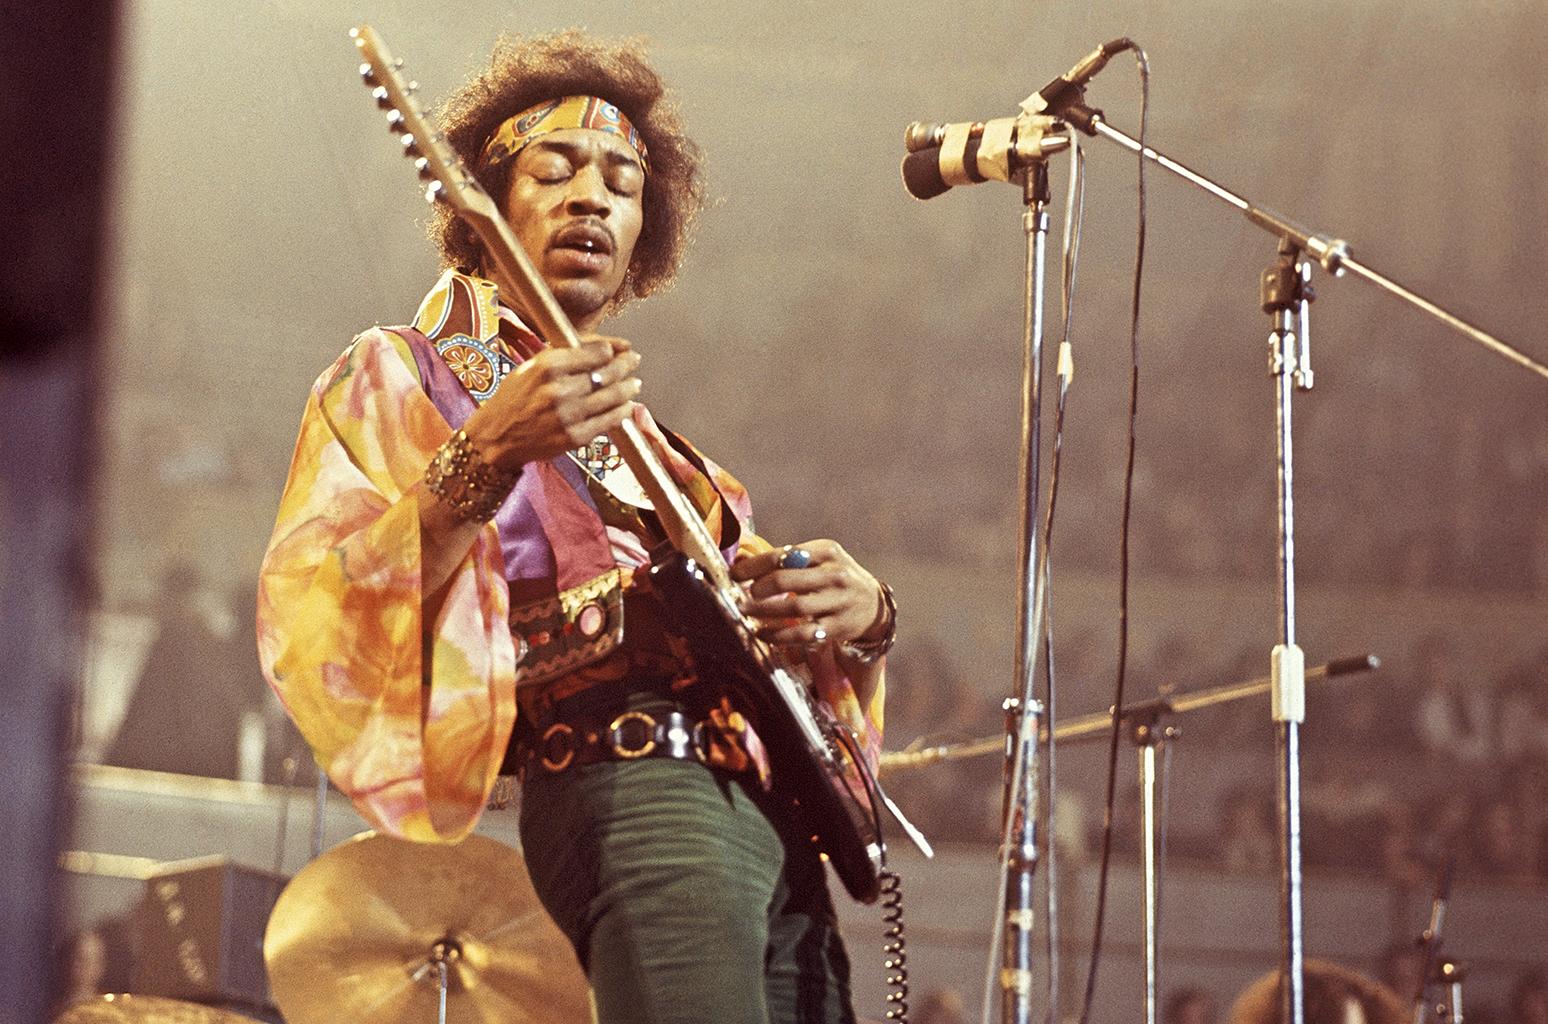 Jimi Hendrix performing at the Royal Albert Hall, London, on February 24, 1969.